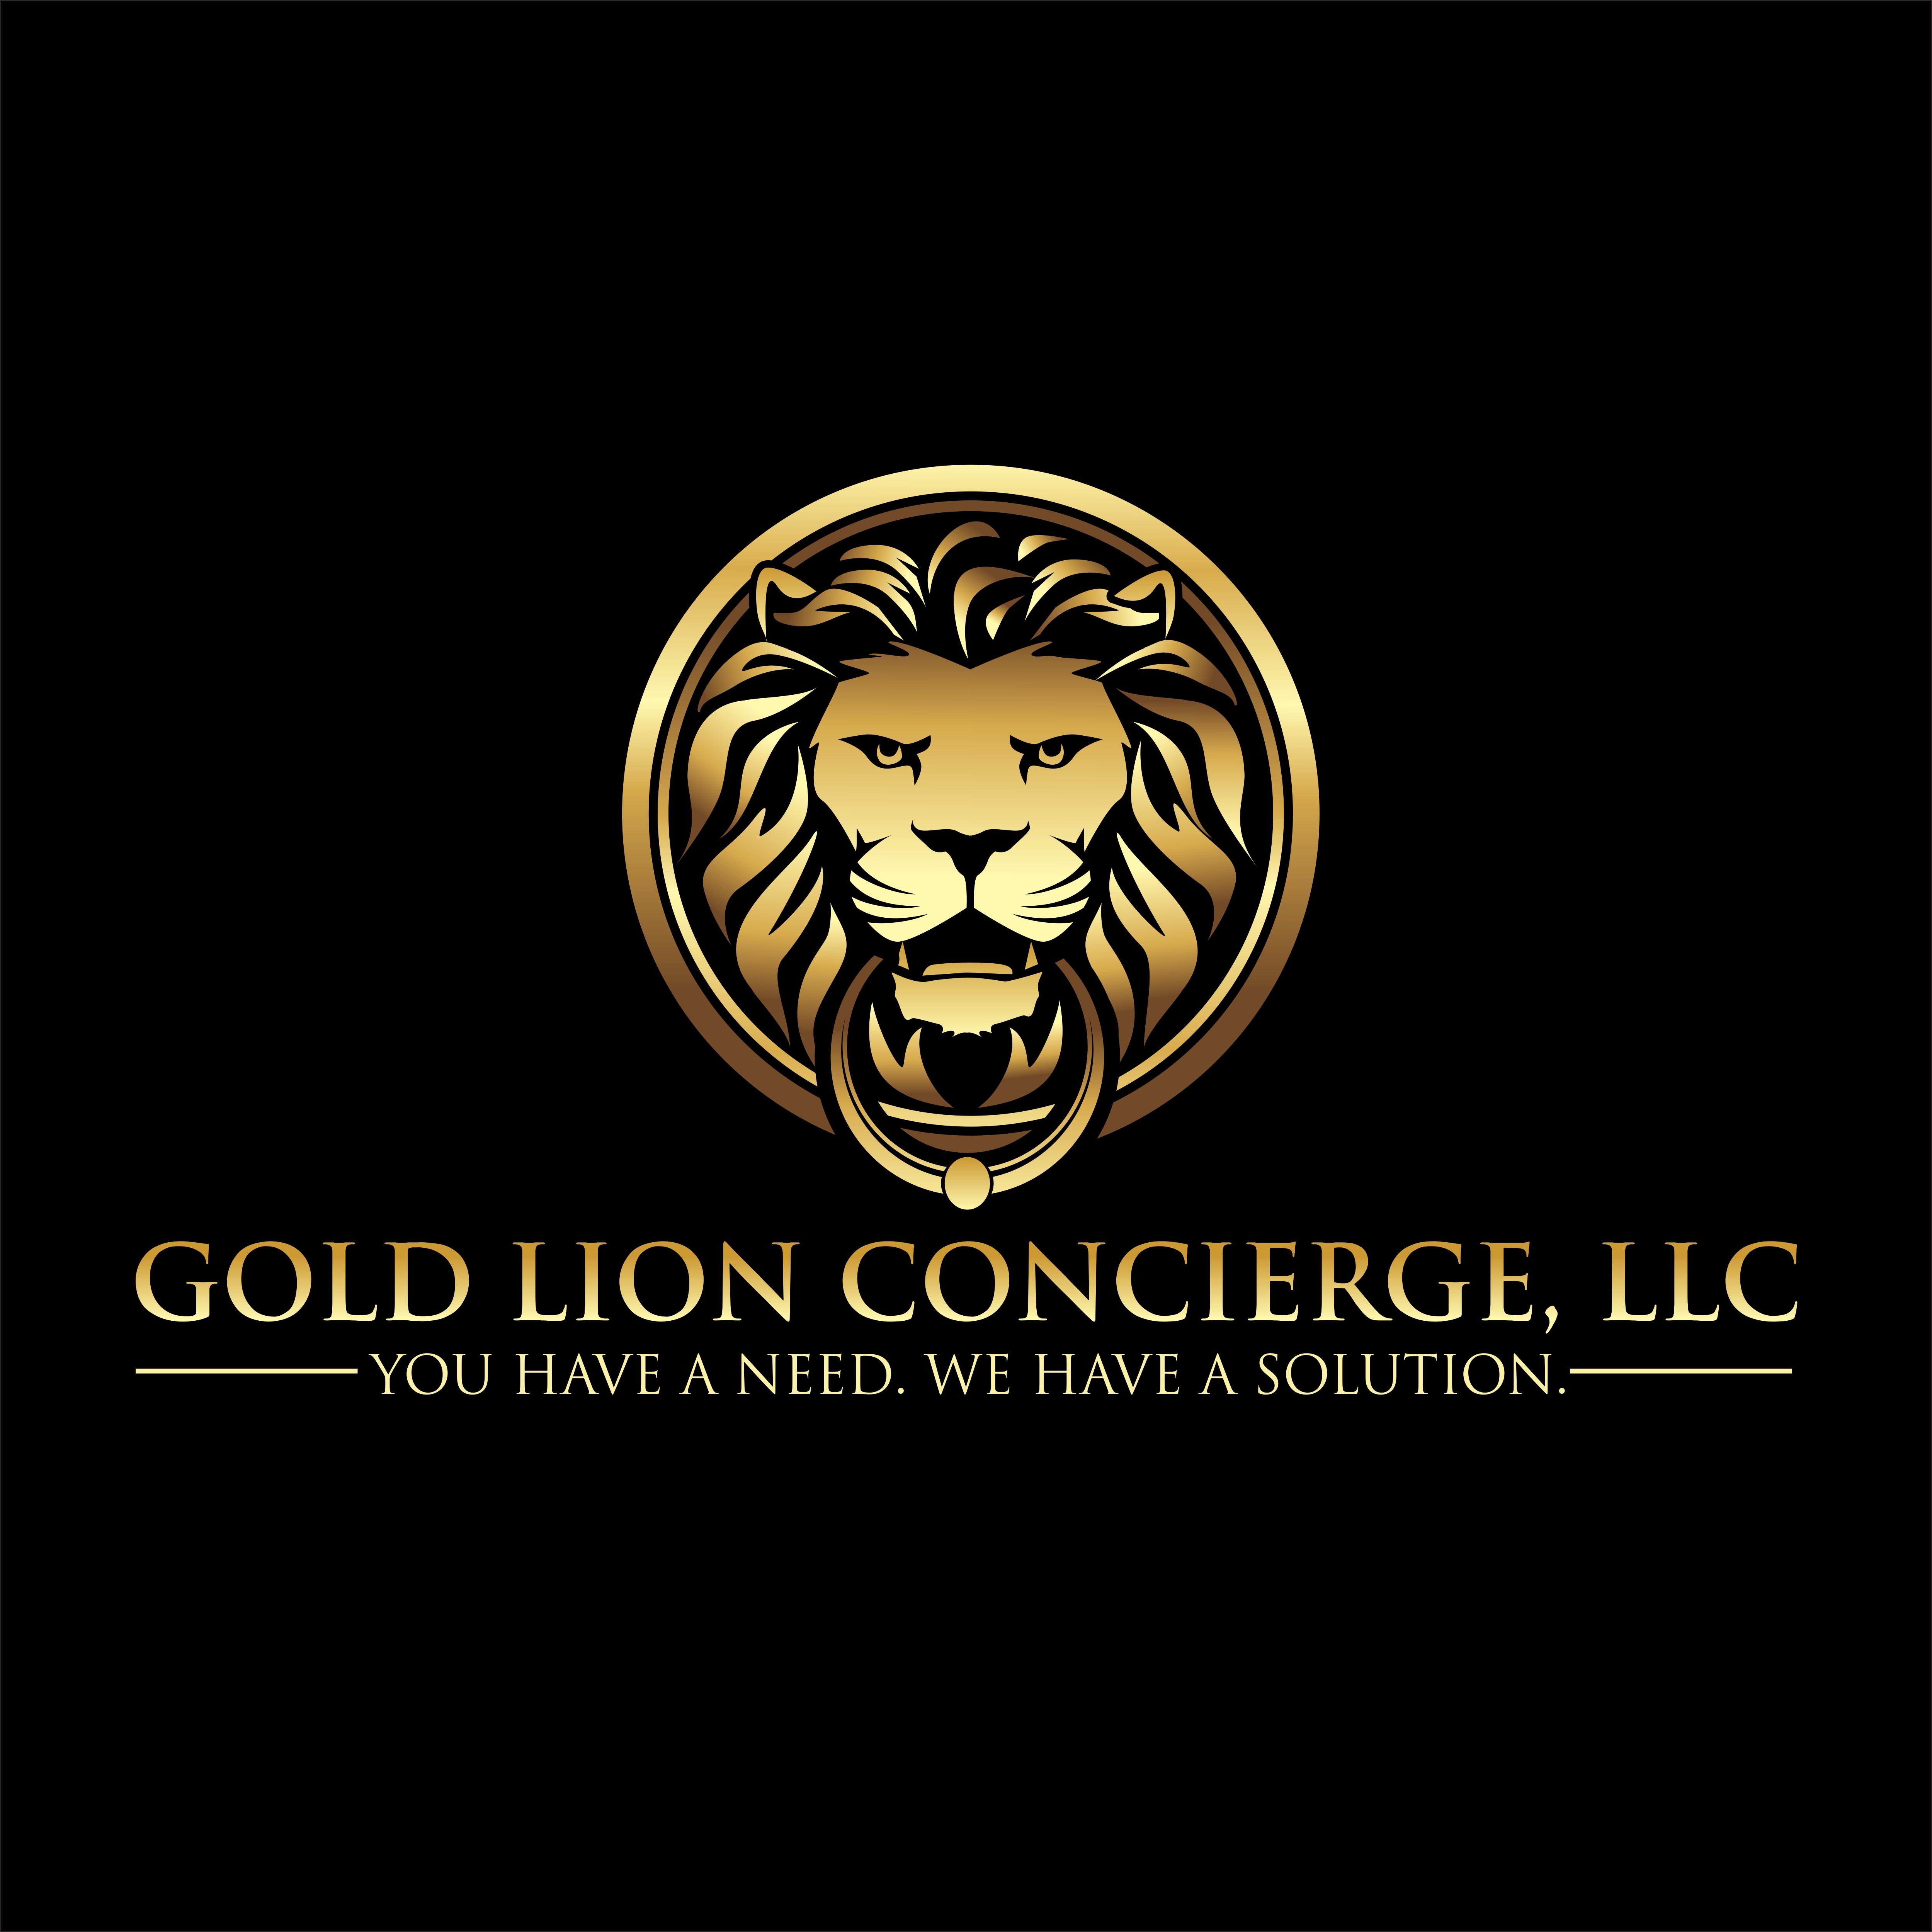 create an innovative gold lion door knocker logo for gold lion concierge, LLC